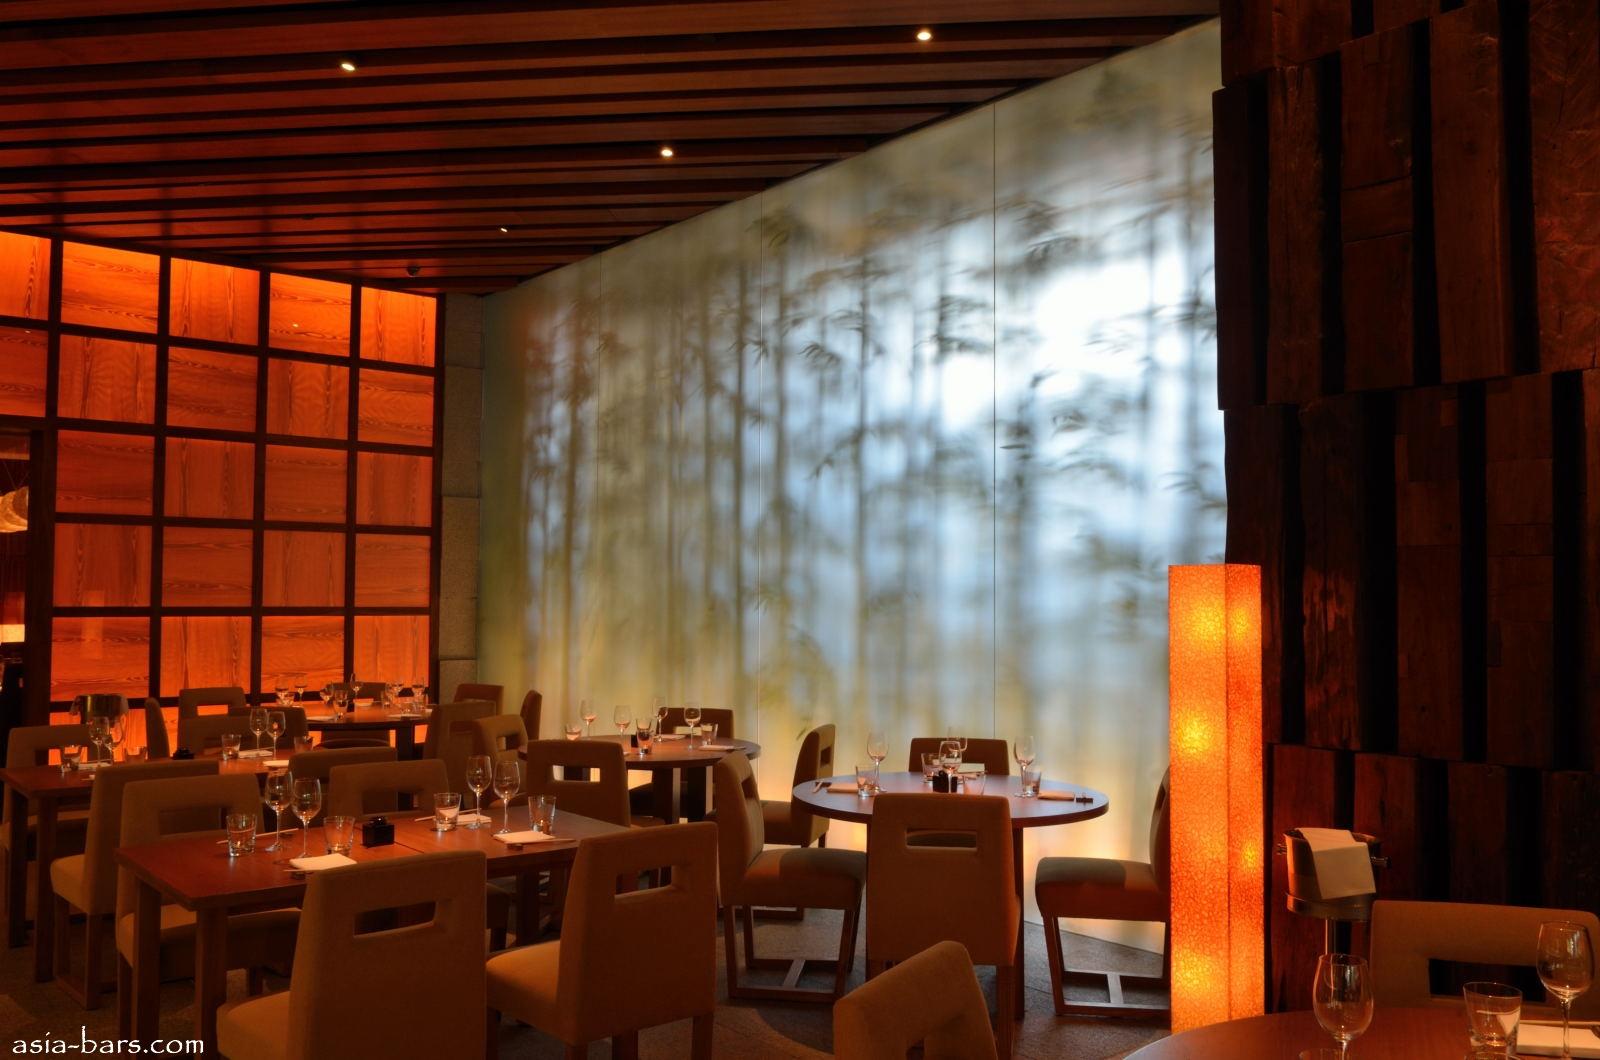 Zuma Bangkok Globally Acclaimed Restaurant Group Opens